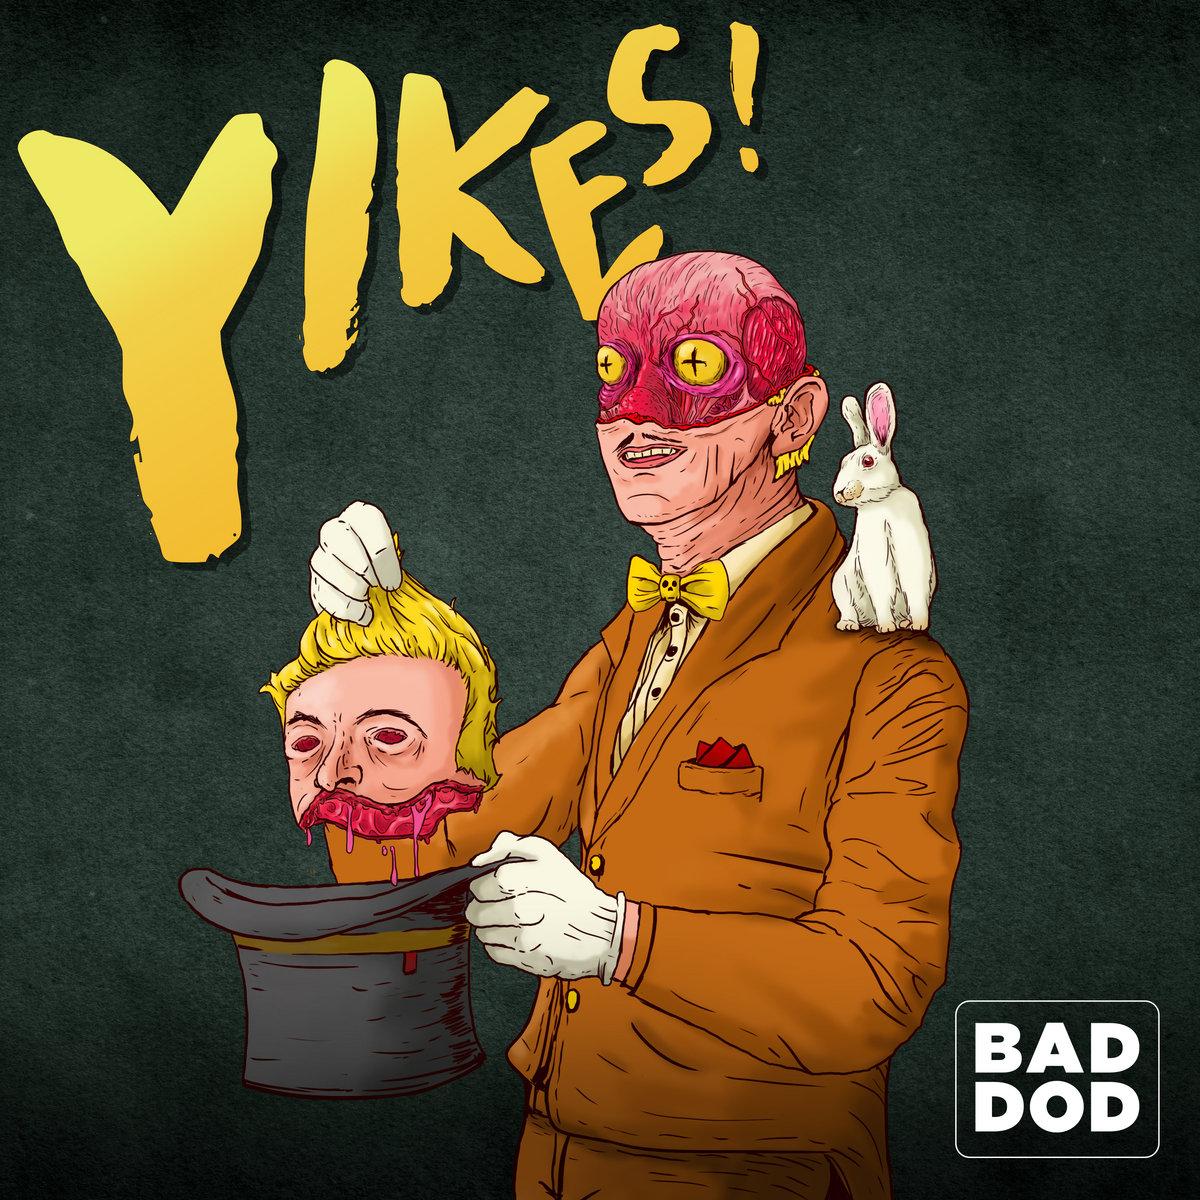 Bad Dod - Yikes